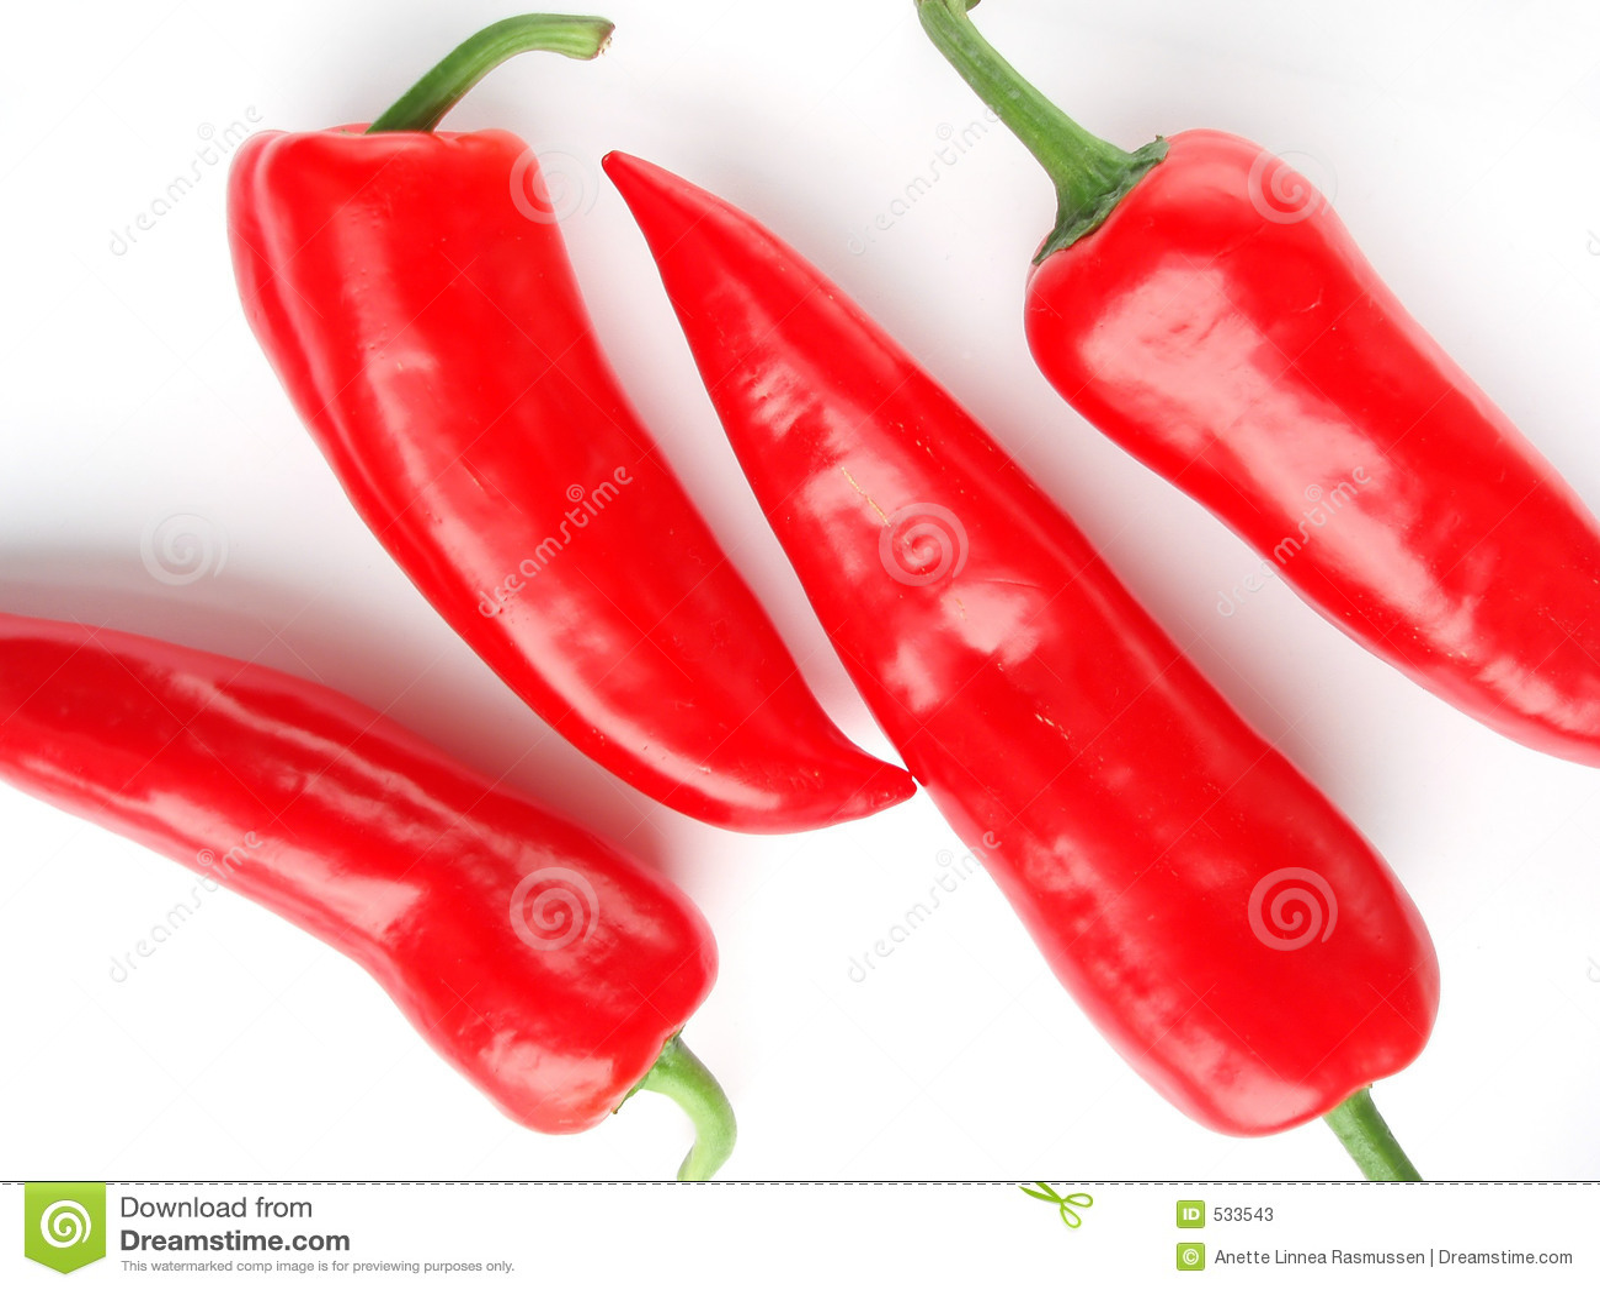 Download 辣椒红色 库存图片. 图片 包括有 副食品, 维生素, 饮食, 可口, 收获, 本质, 空白, 内部, 红色 - 533543